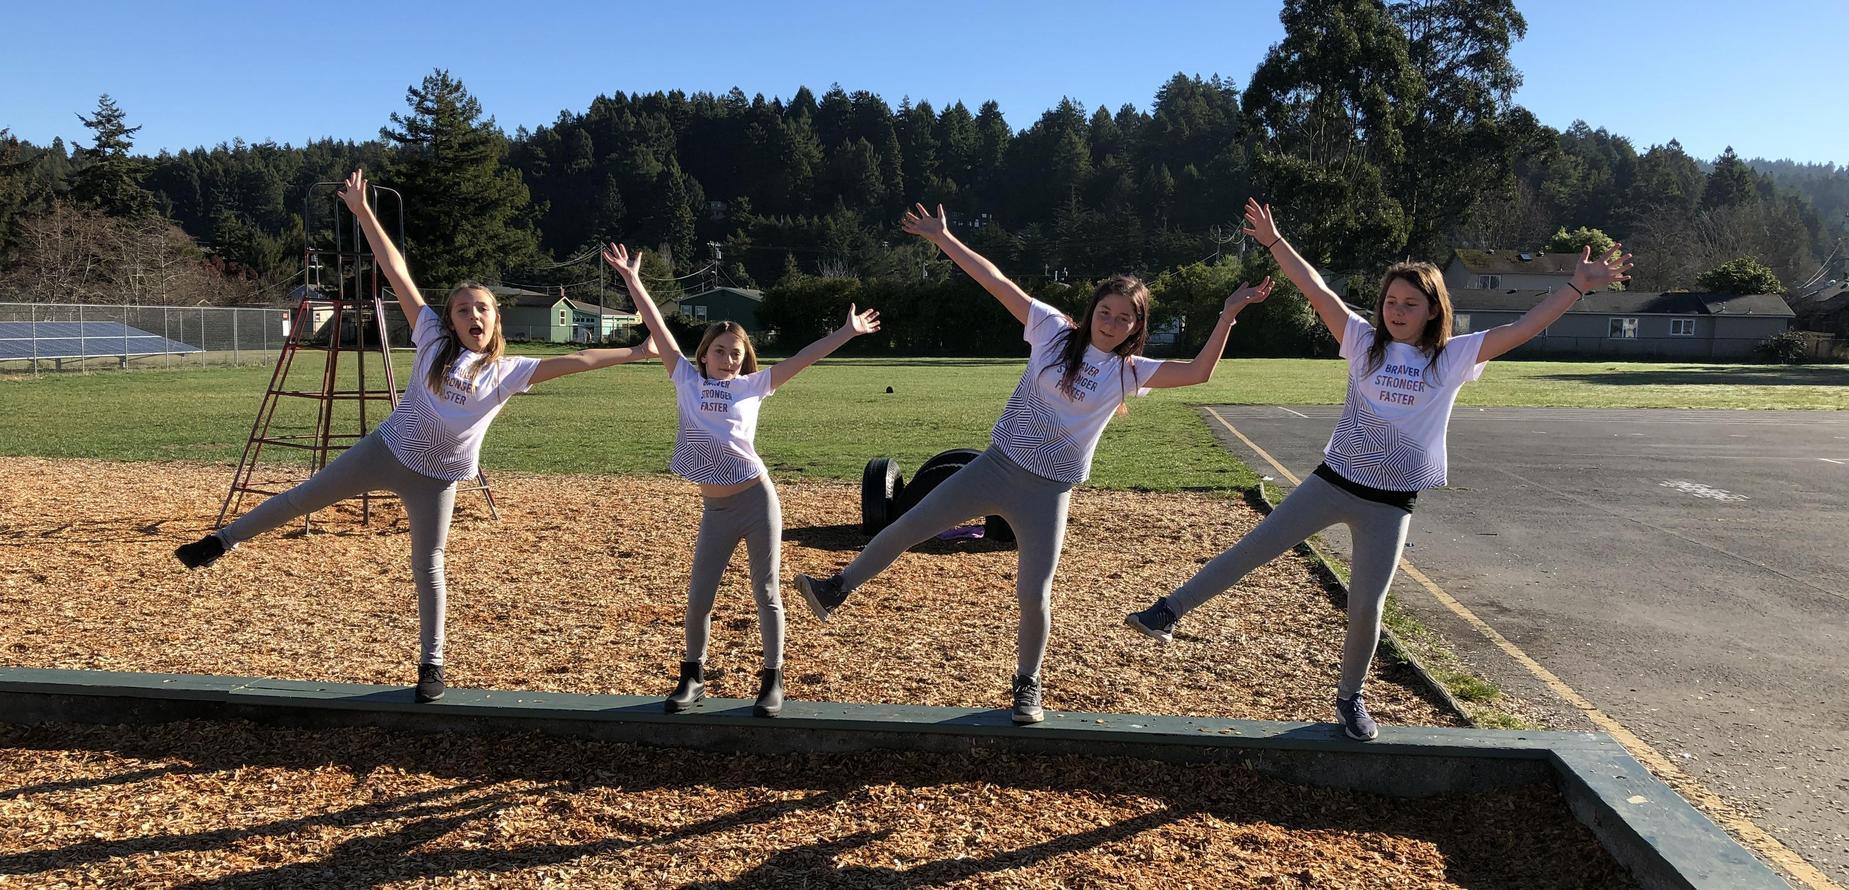 4 girls jumping